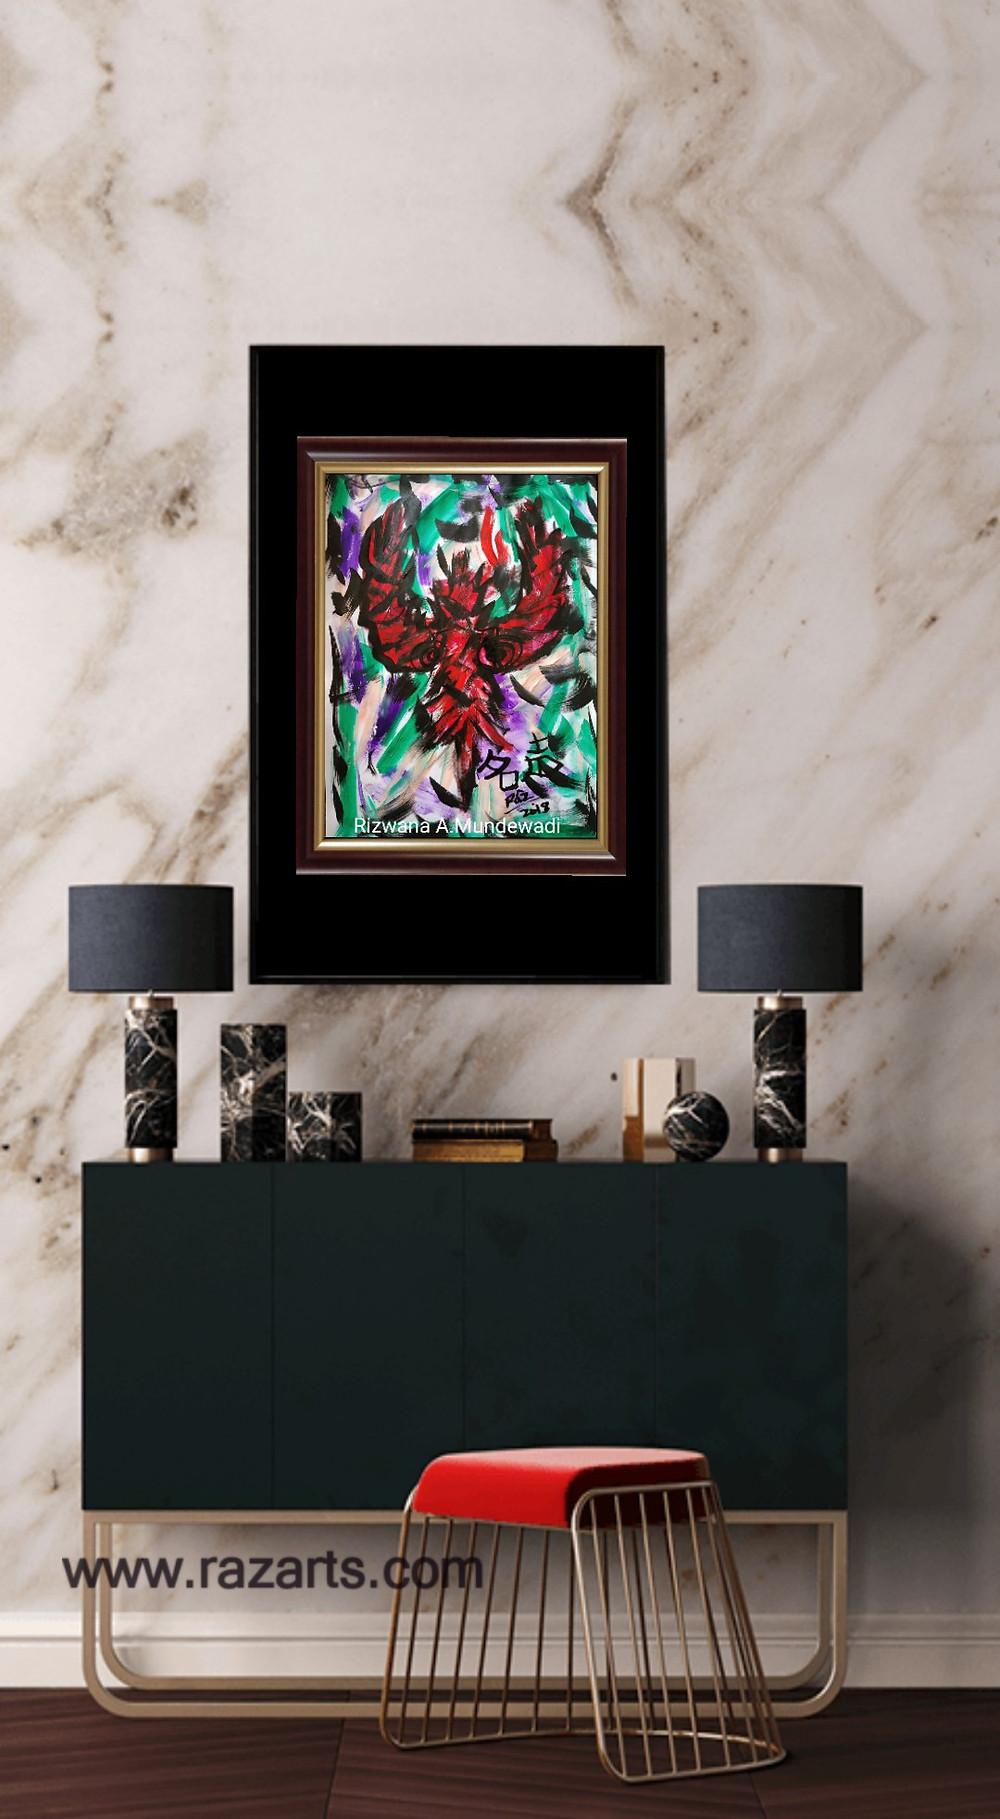 Phoenic Rising Feng shuii Reiki Amar Pakshi painting for sale